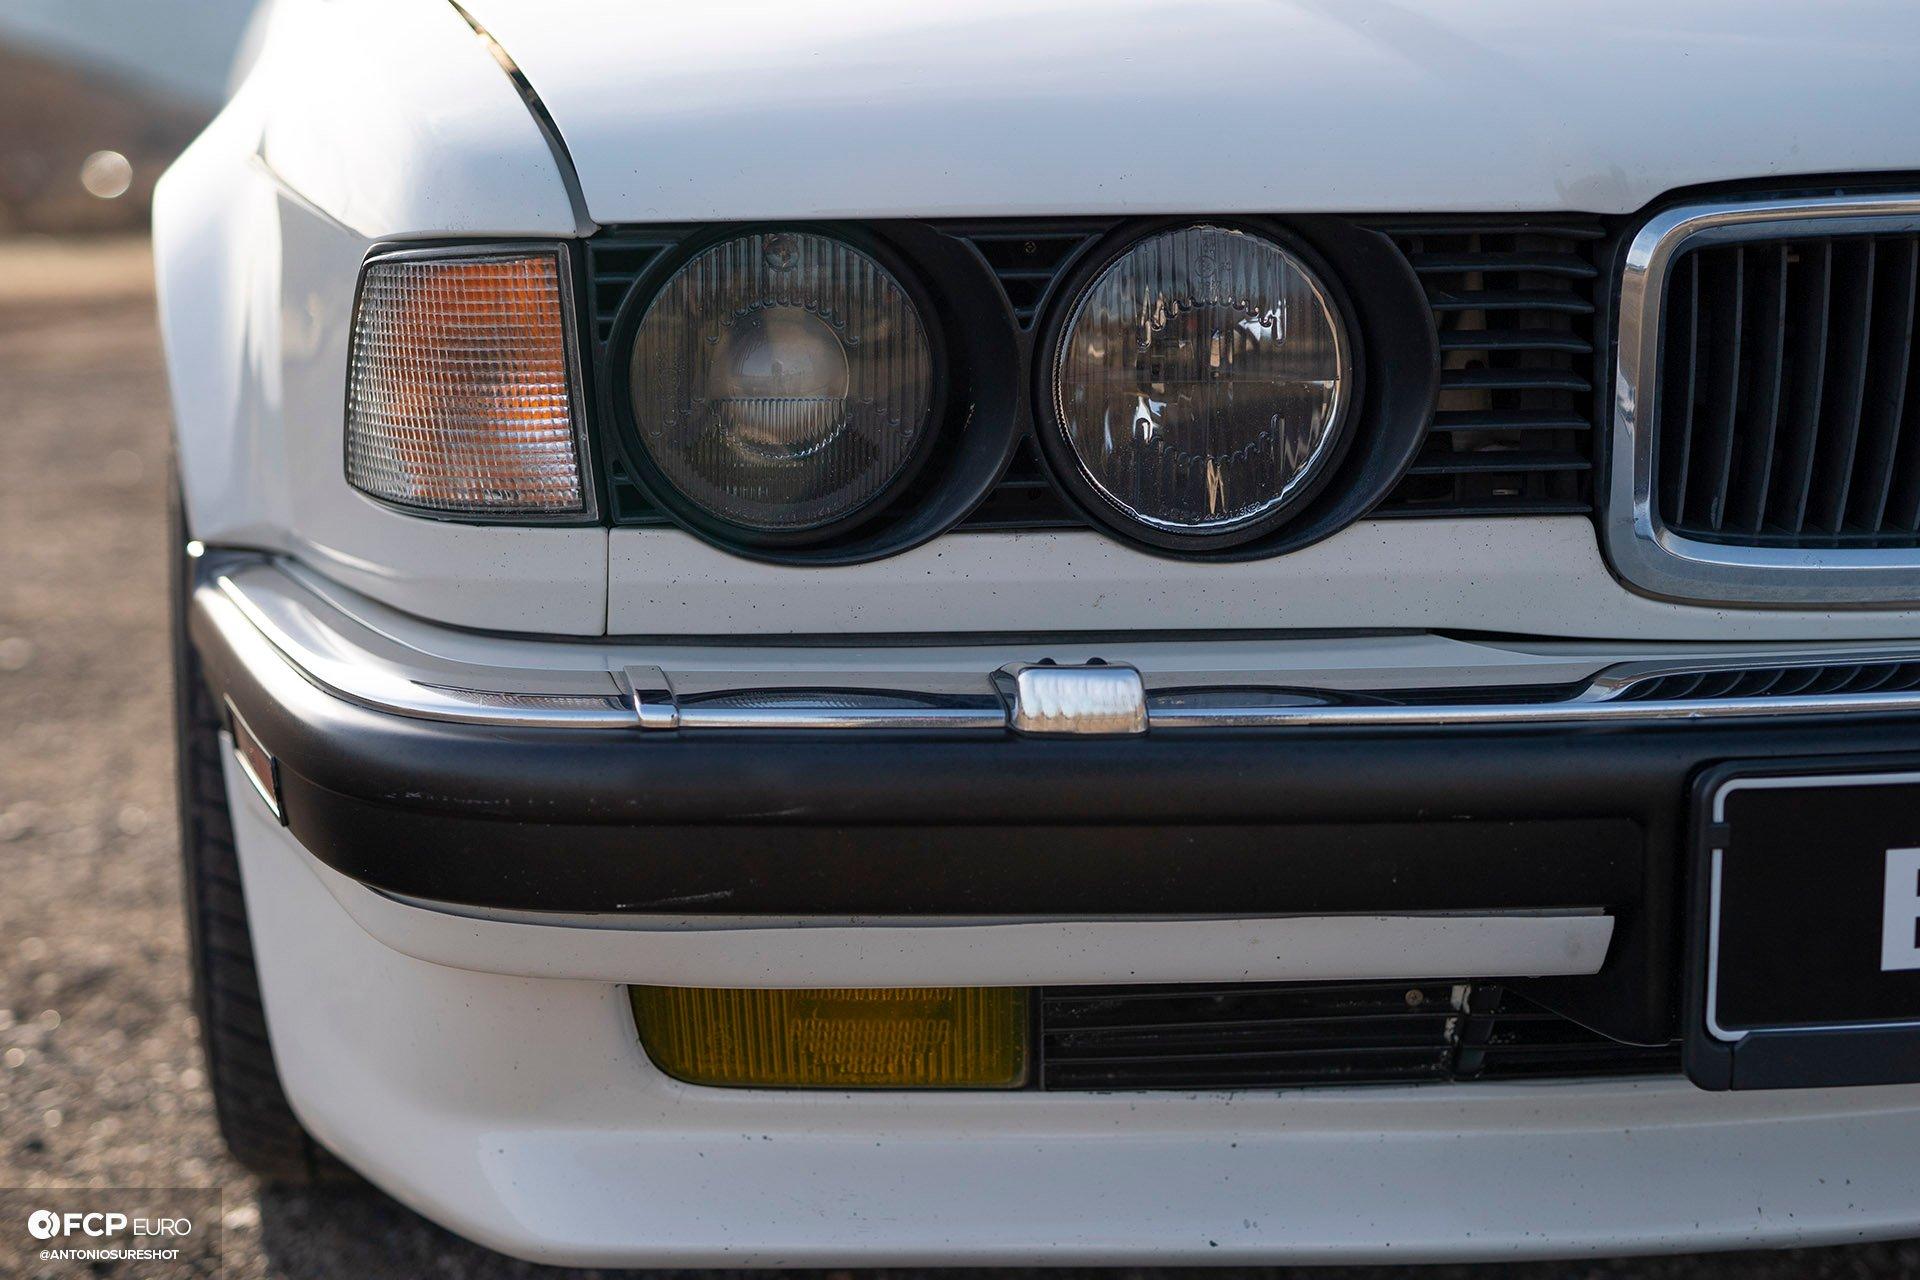 BMW E32 750iL 6 speed A9A02557